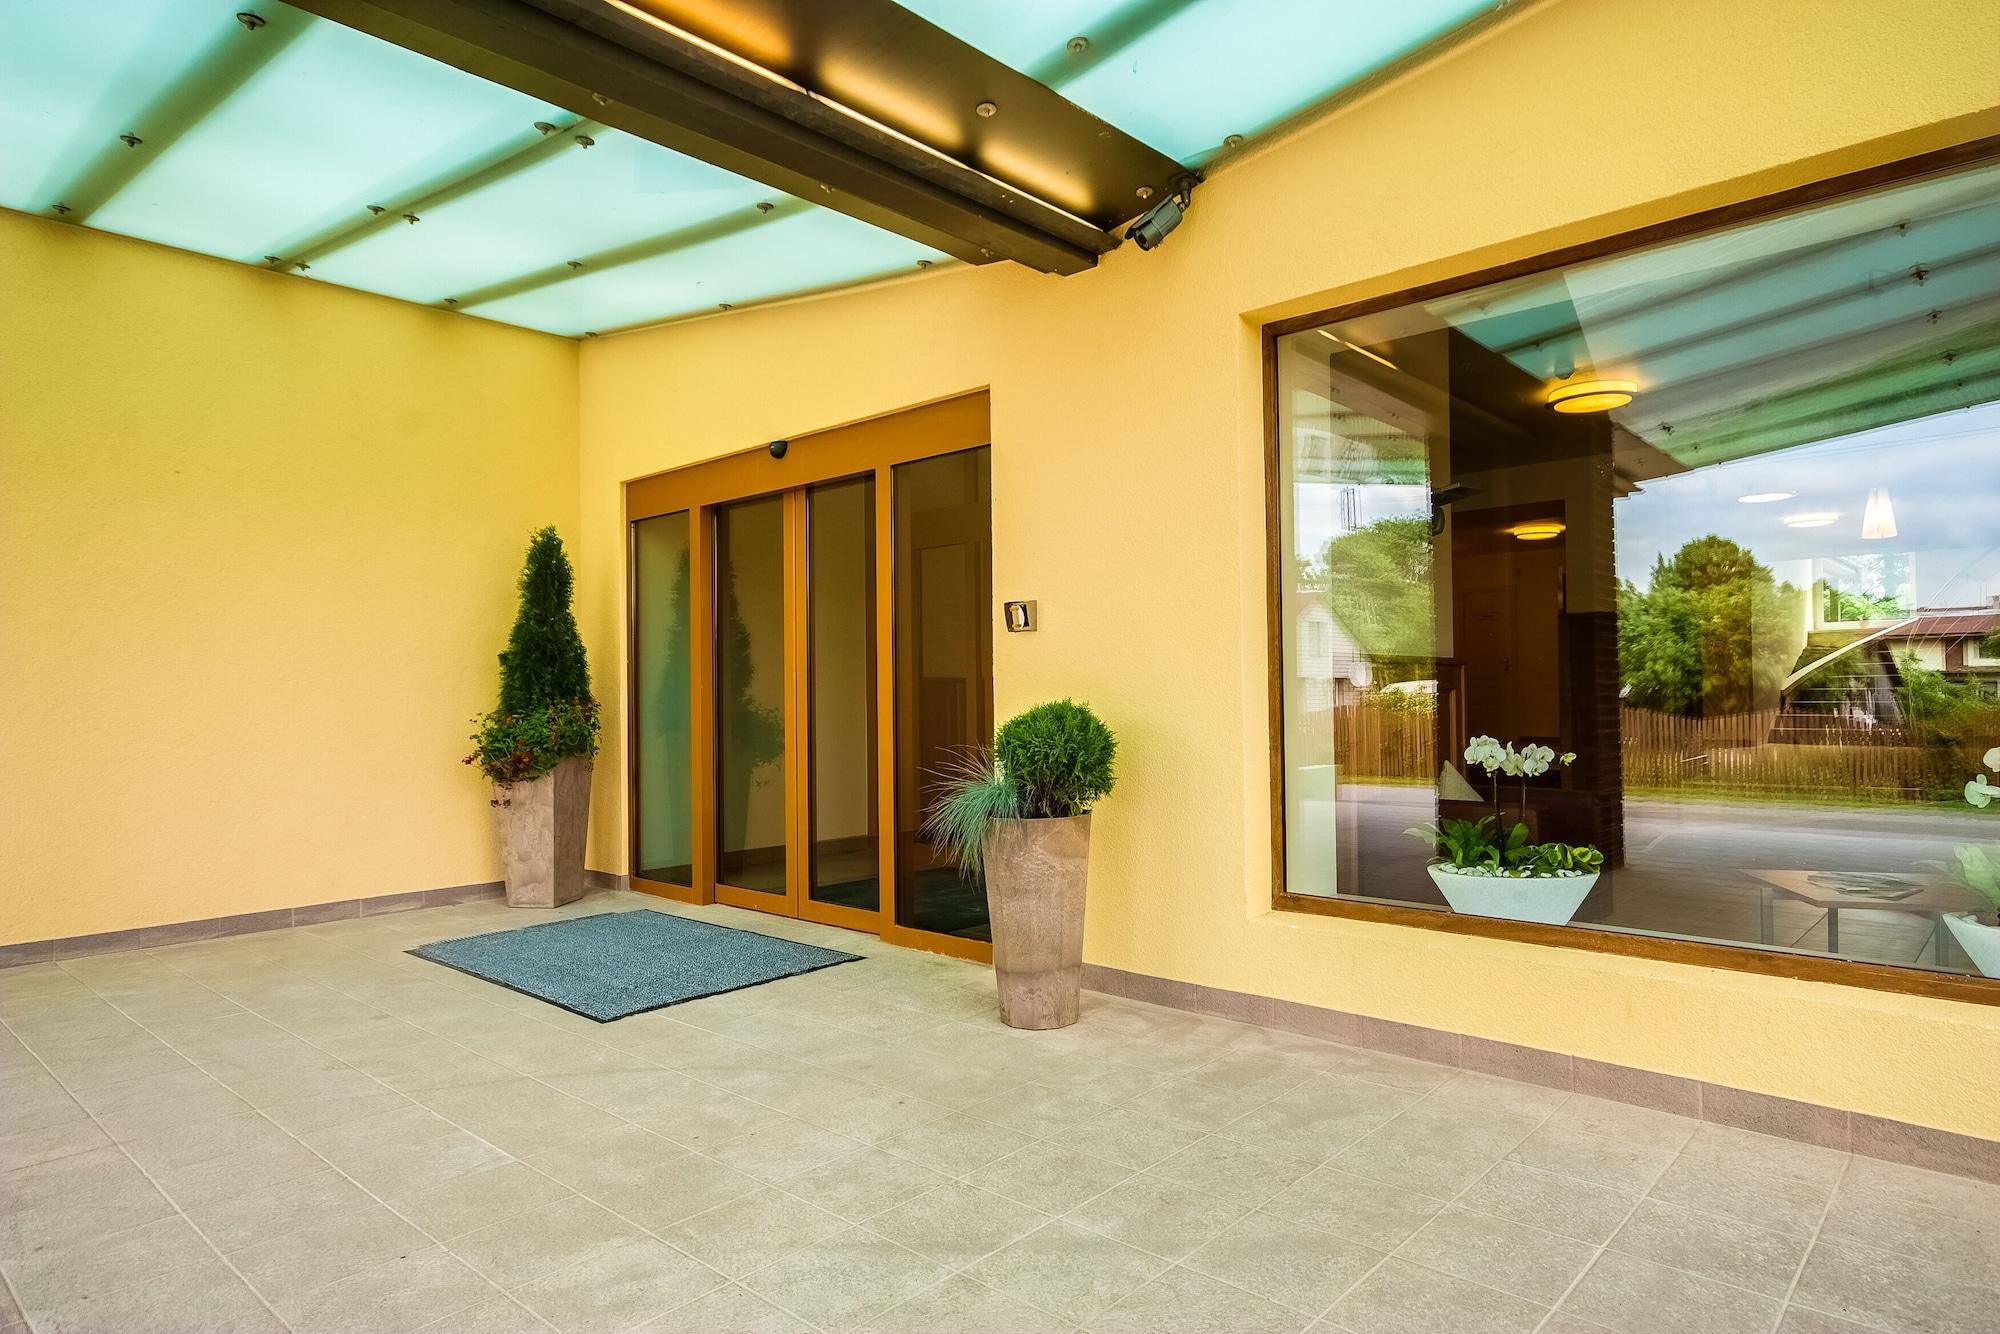 Hotel Tigra, Cesis